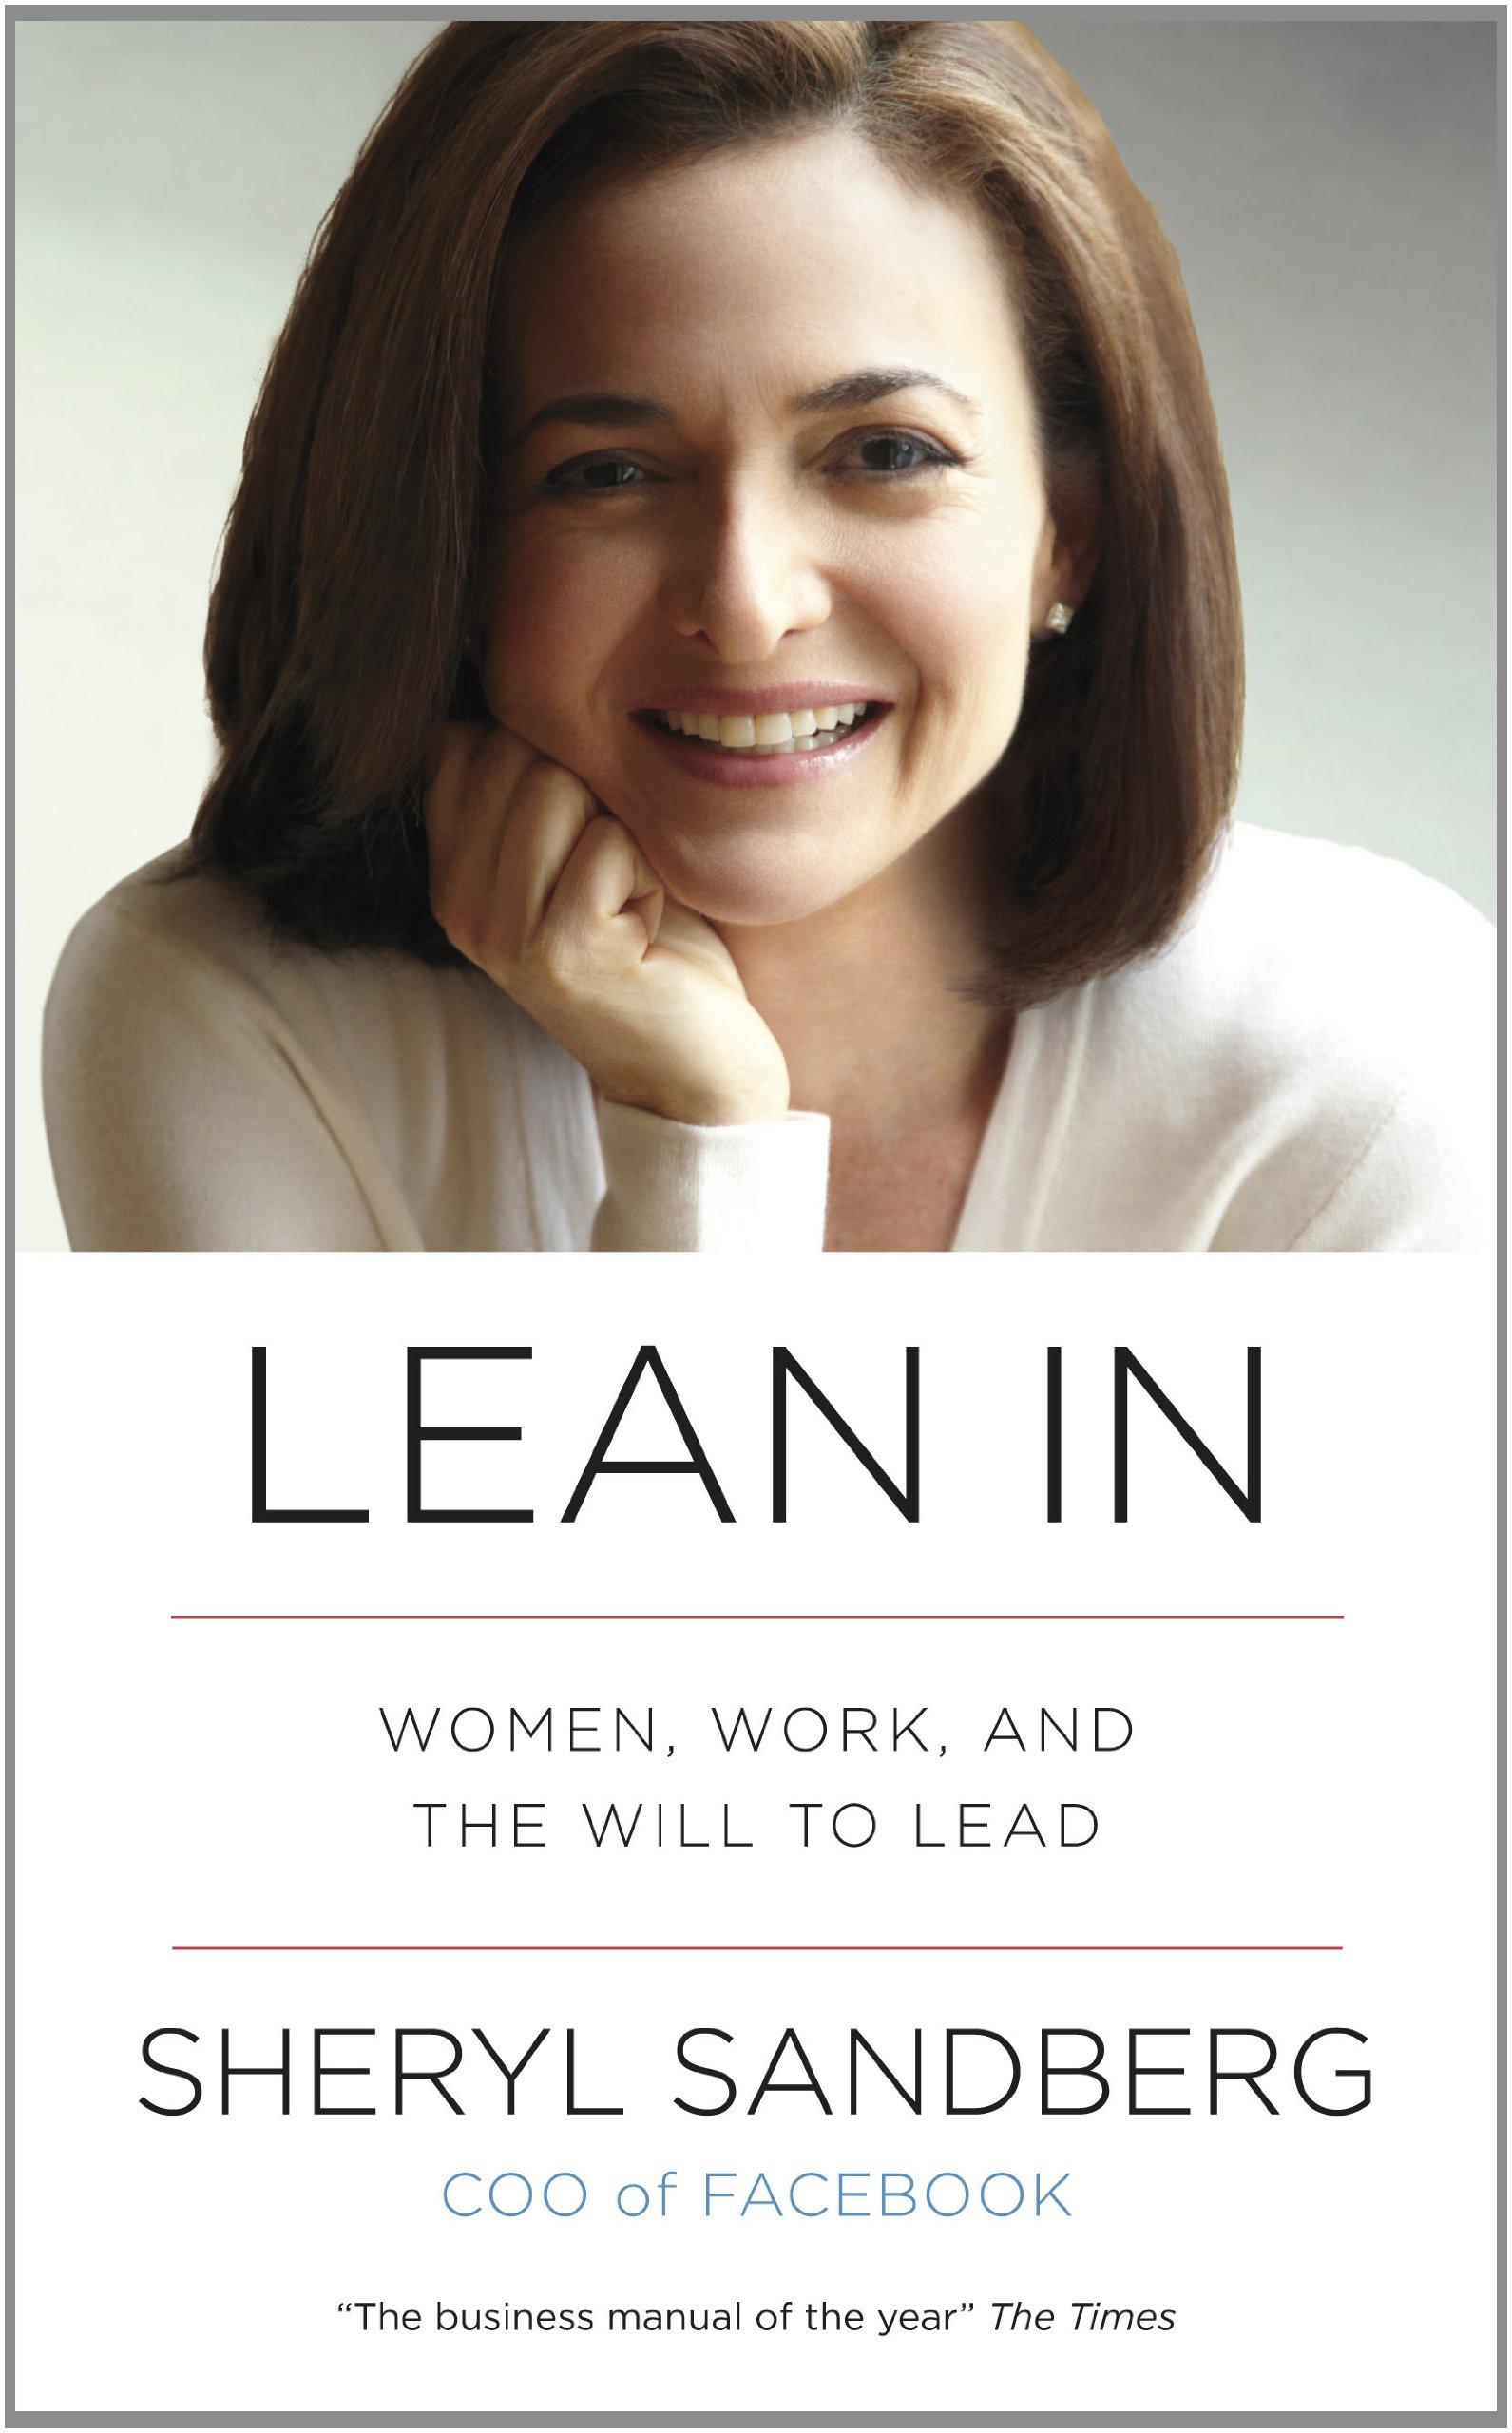 lean in sheryl sandberg - global girl boss - lean in circles - women empowerment - empowering women